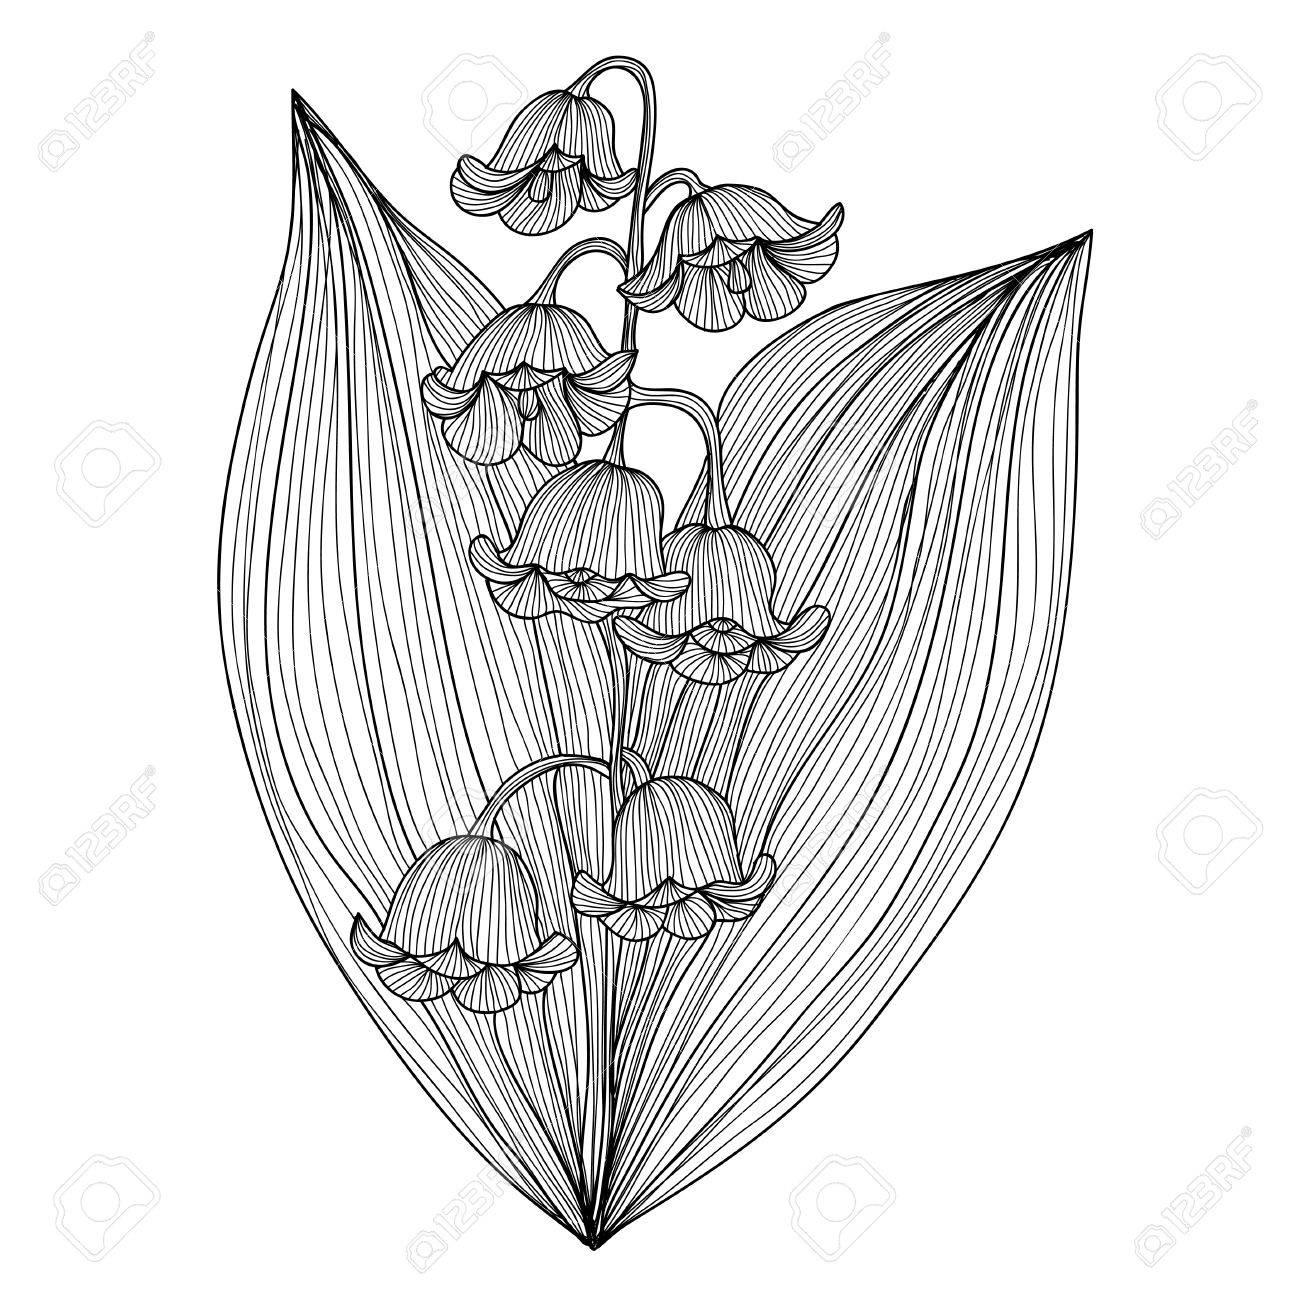 Elegant Decorative Lily Od The Valley Flowers, Design Element ...